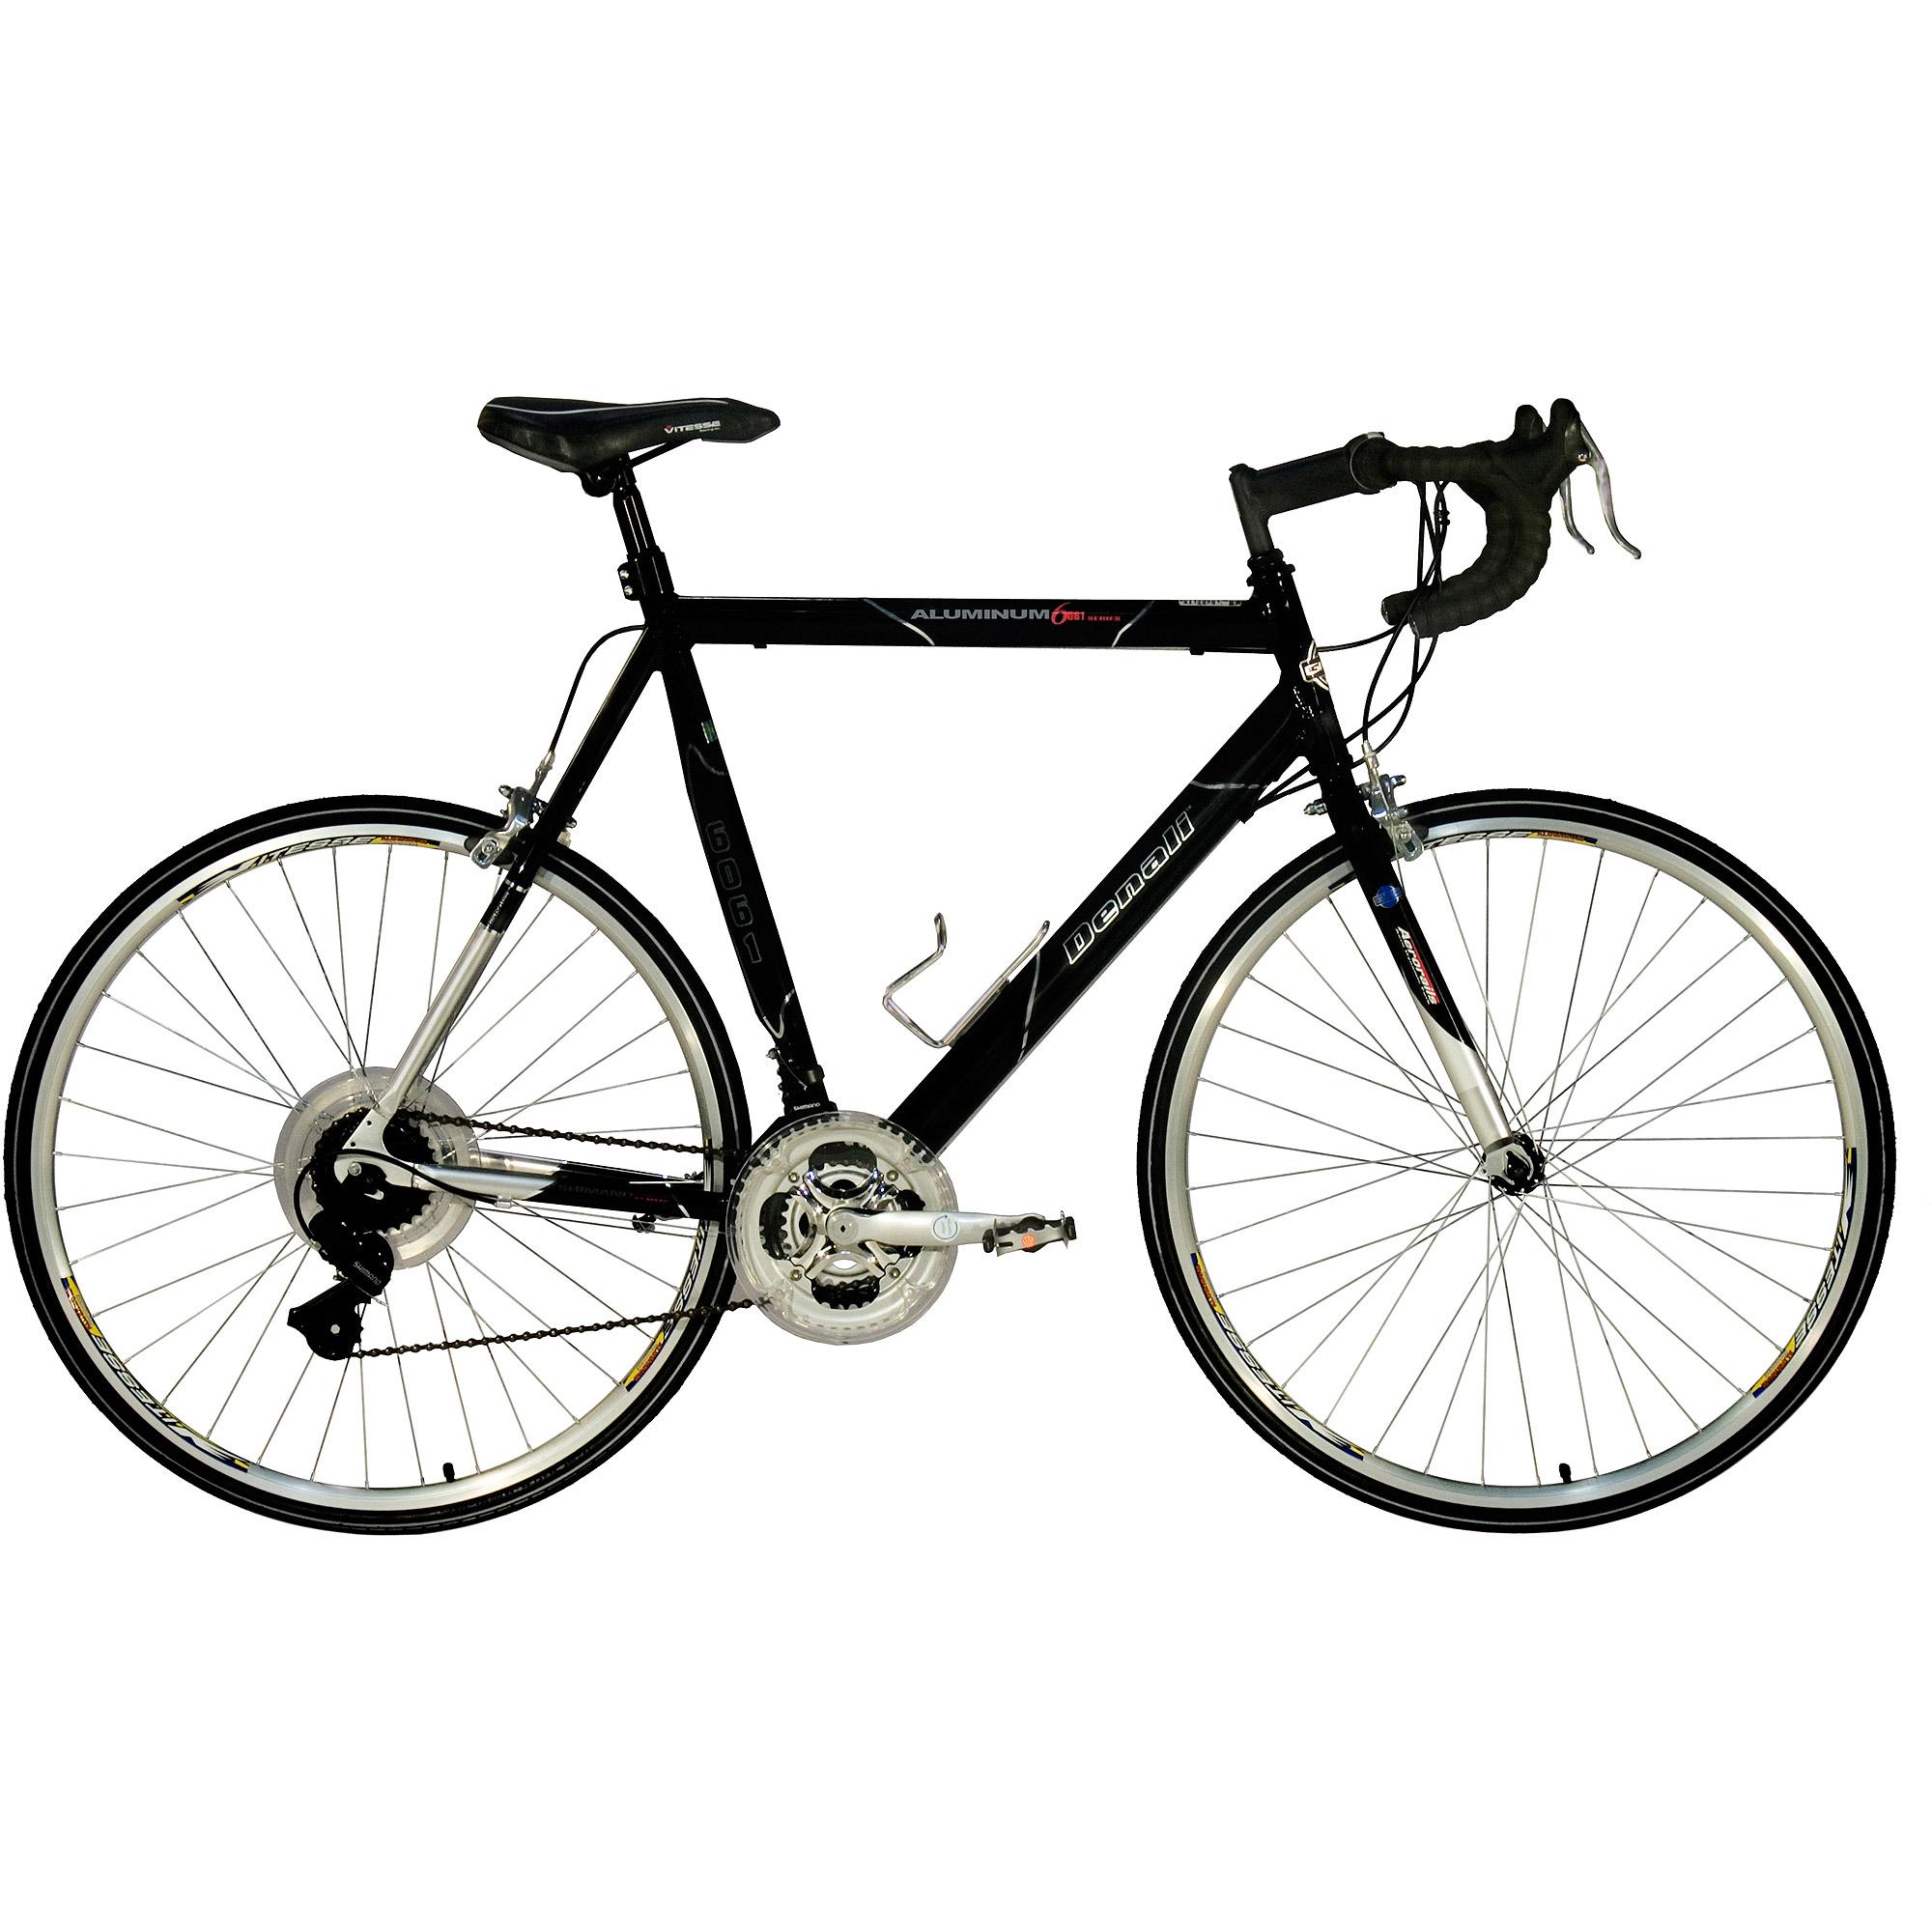 "25"" GMC Denali 700c Men's Road Bike, Black"